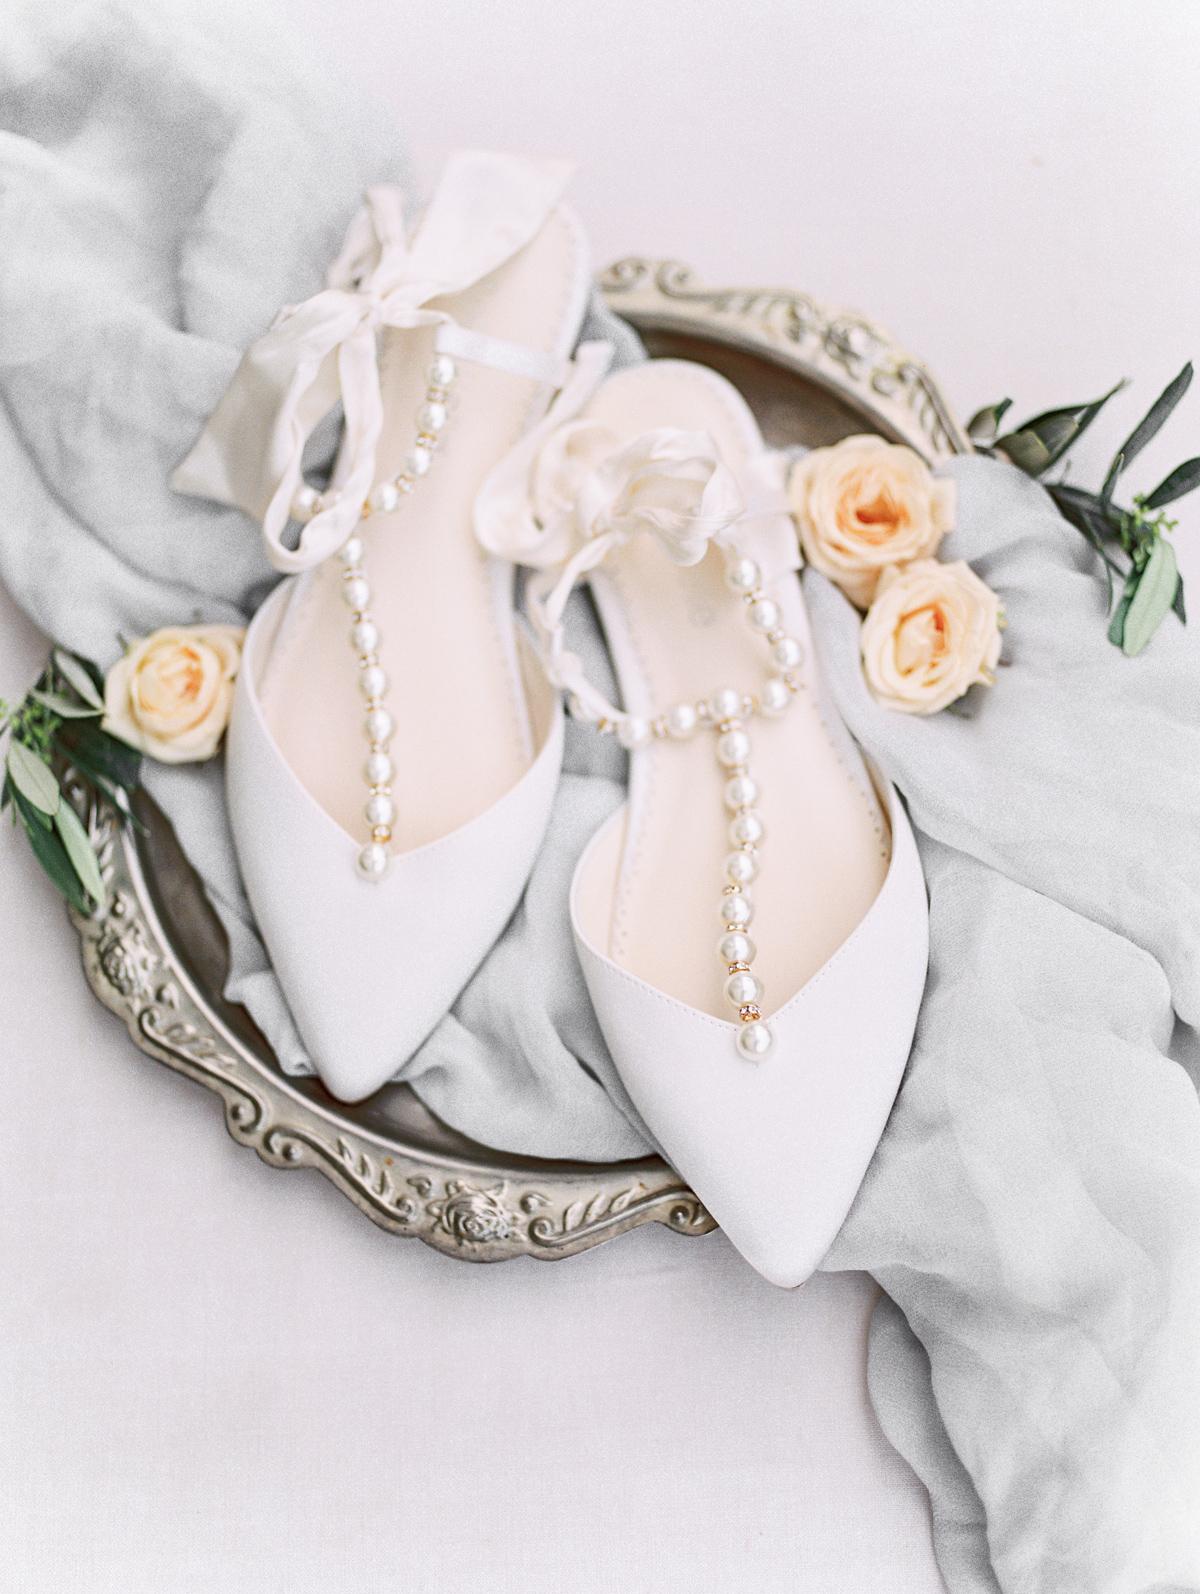 saghar ben wedding accessories brides shoes